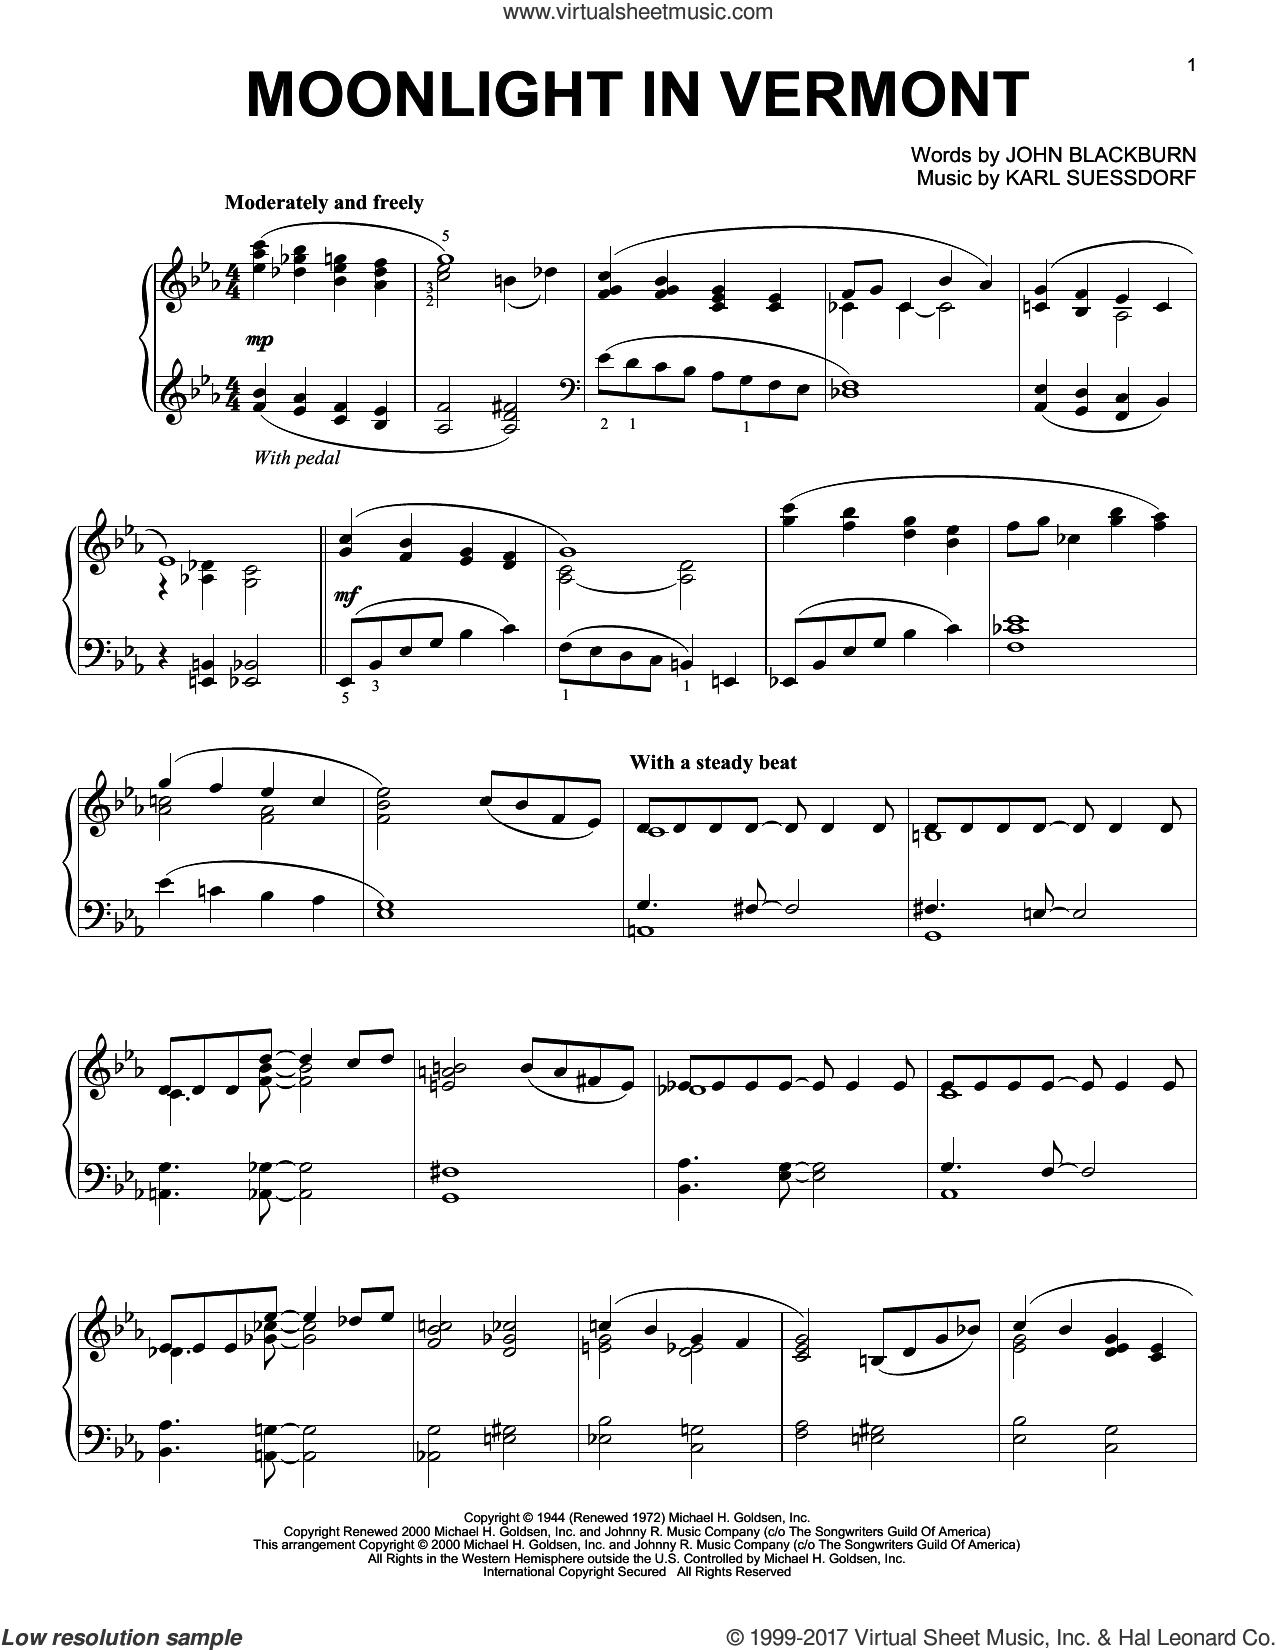 Moonlight In Vermont, (intermediate) sheet music for piano solo by Karl Suessdorf and John Blackburn, intermediate skill level